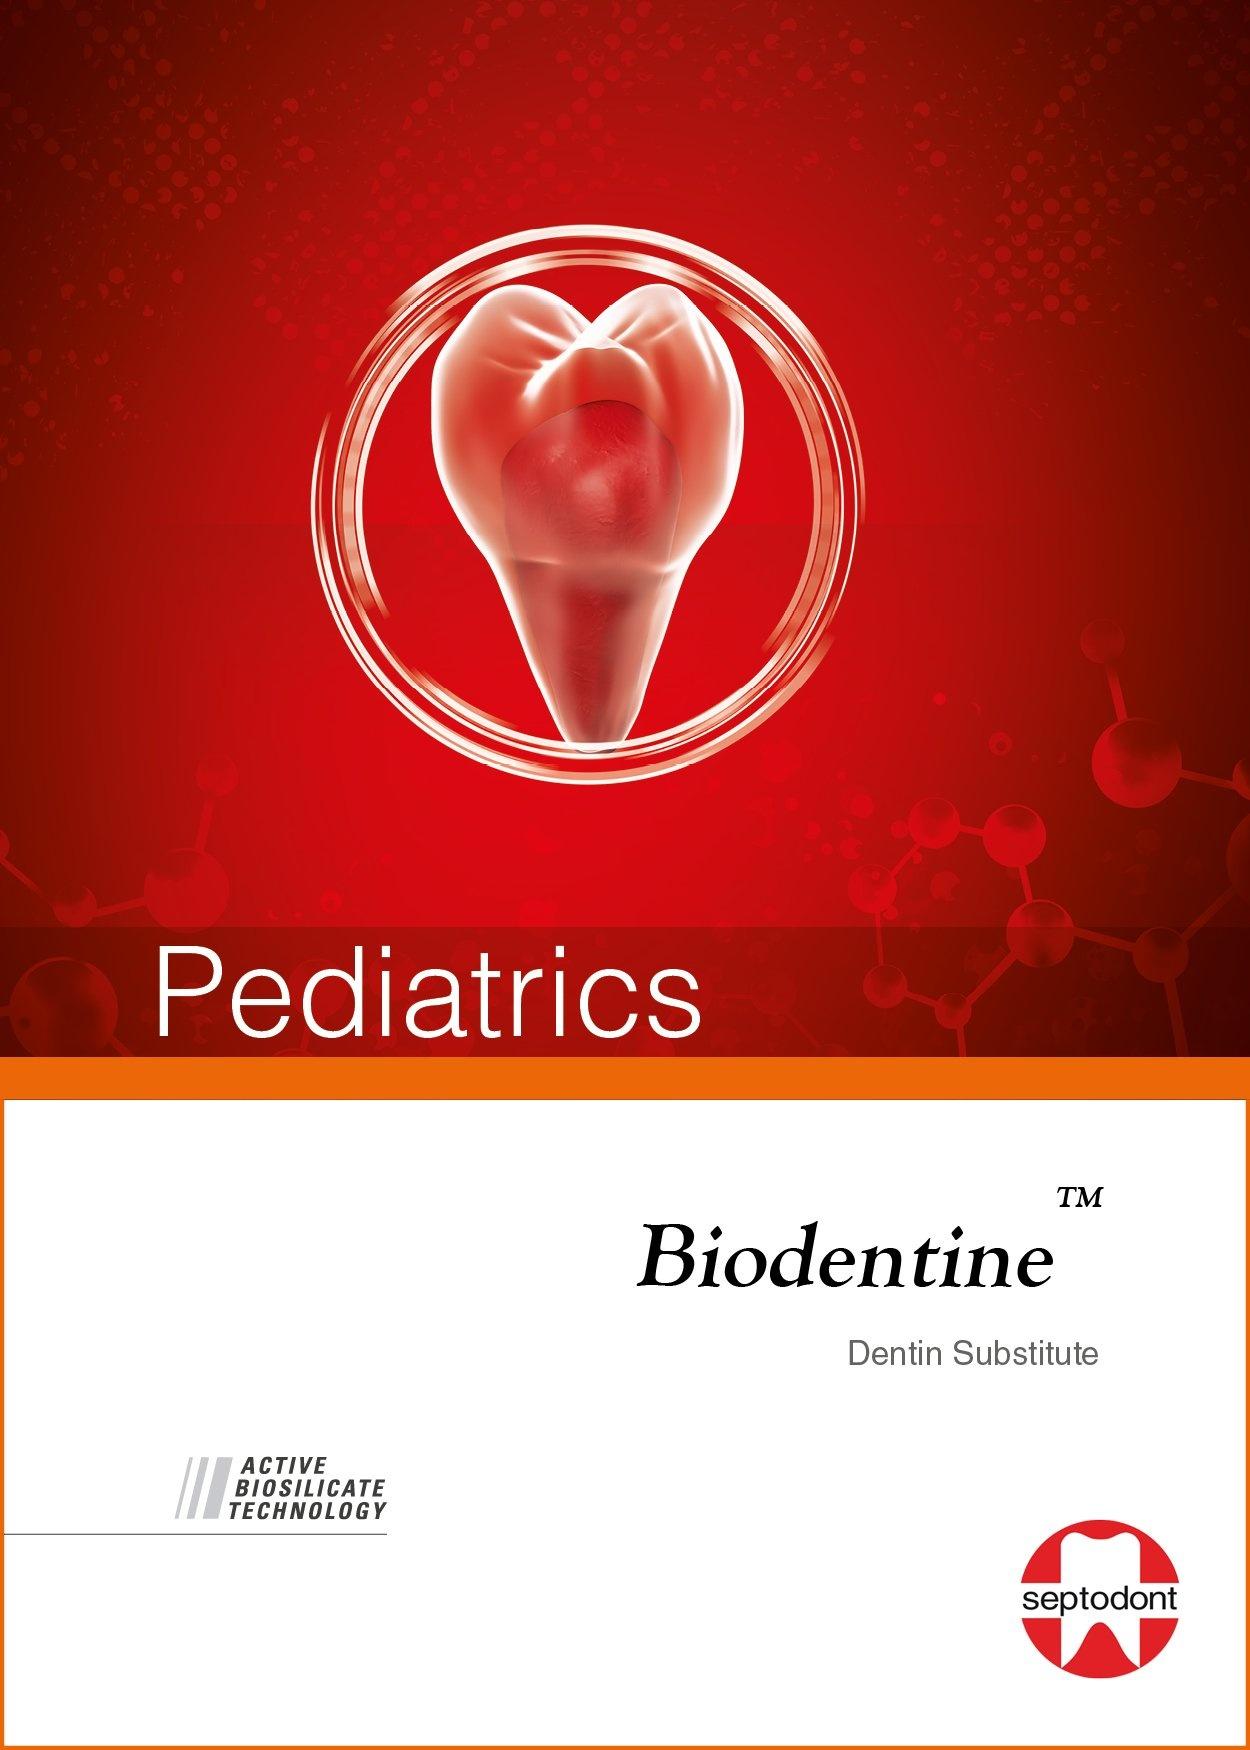 Biodentine - Pediatrics brochure